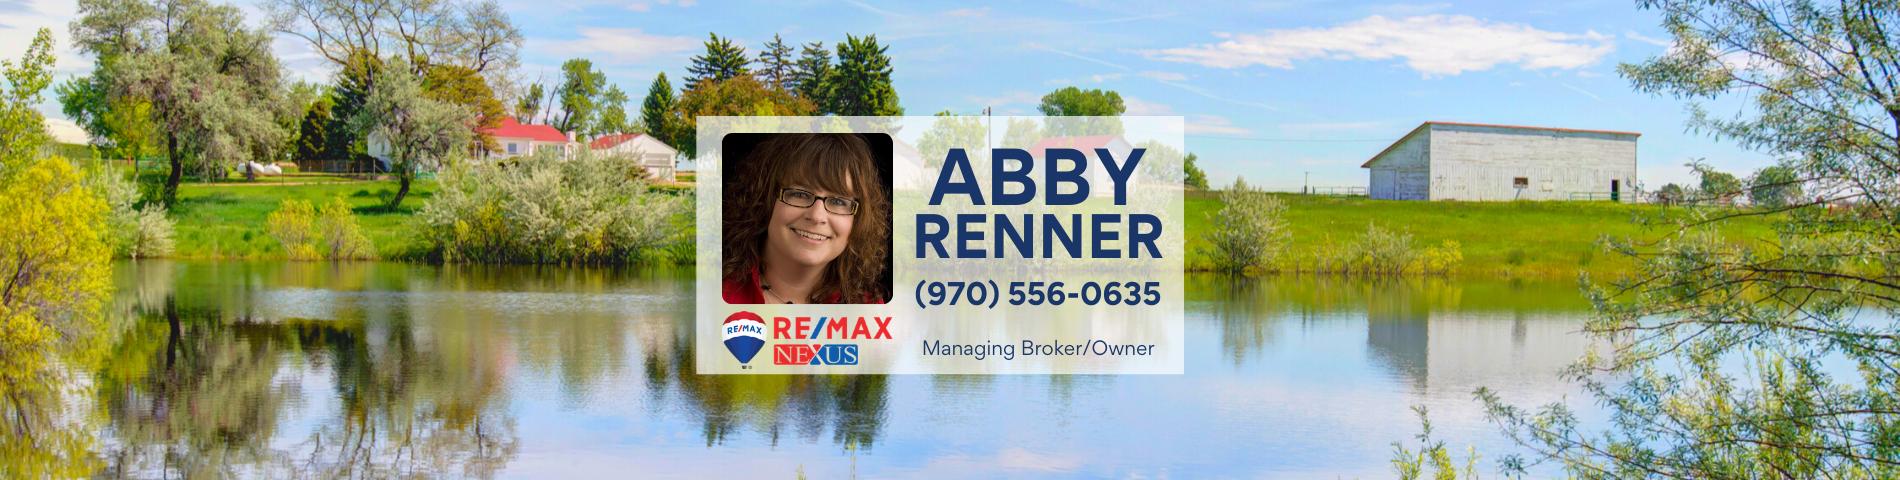 ABBY RENNER